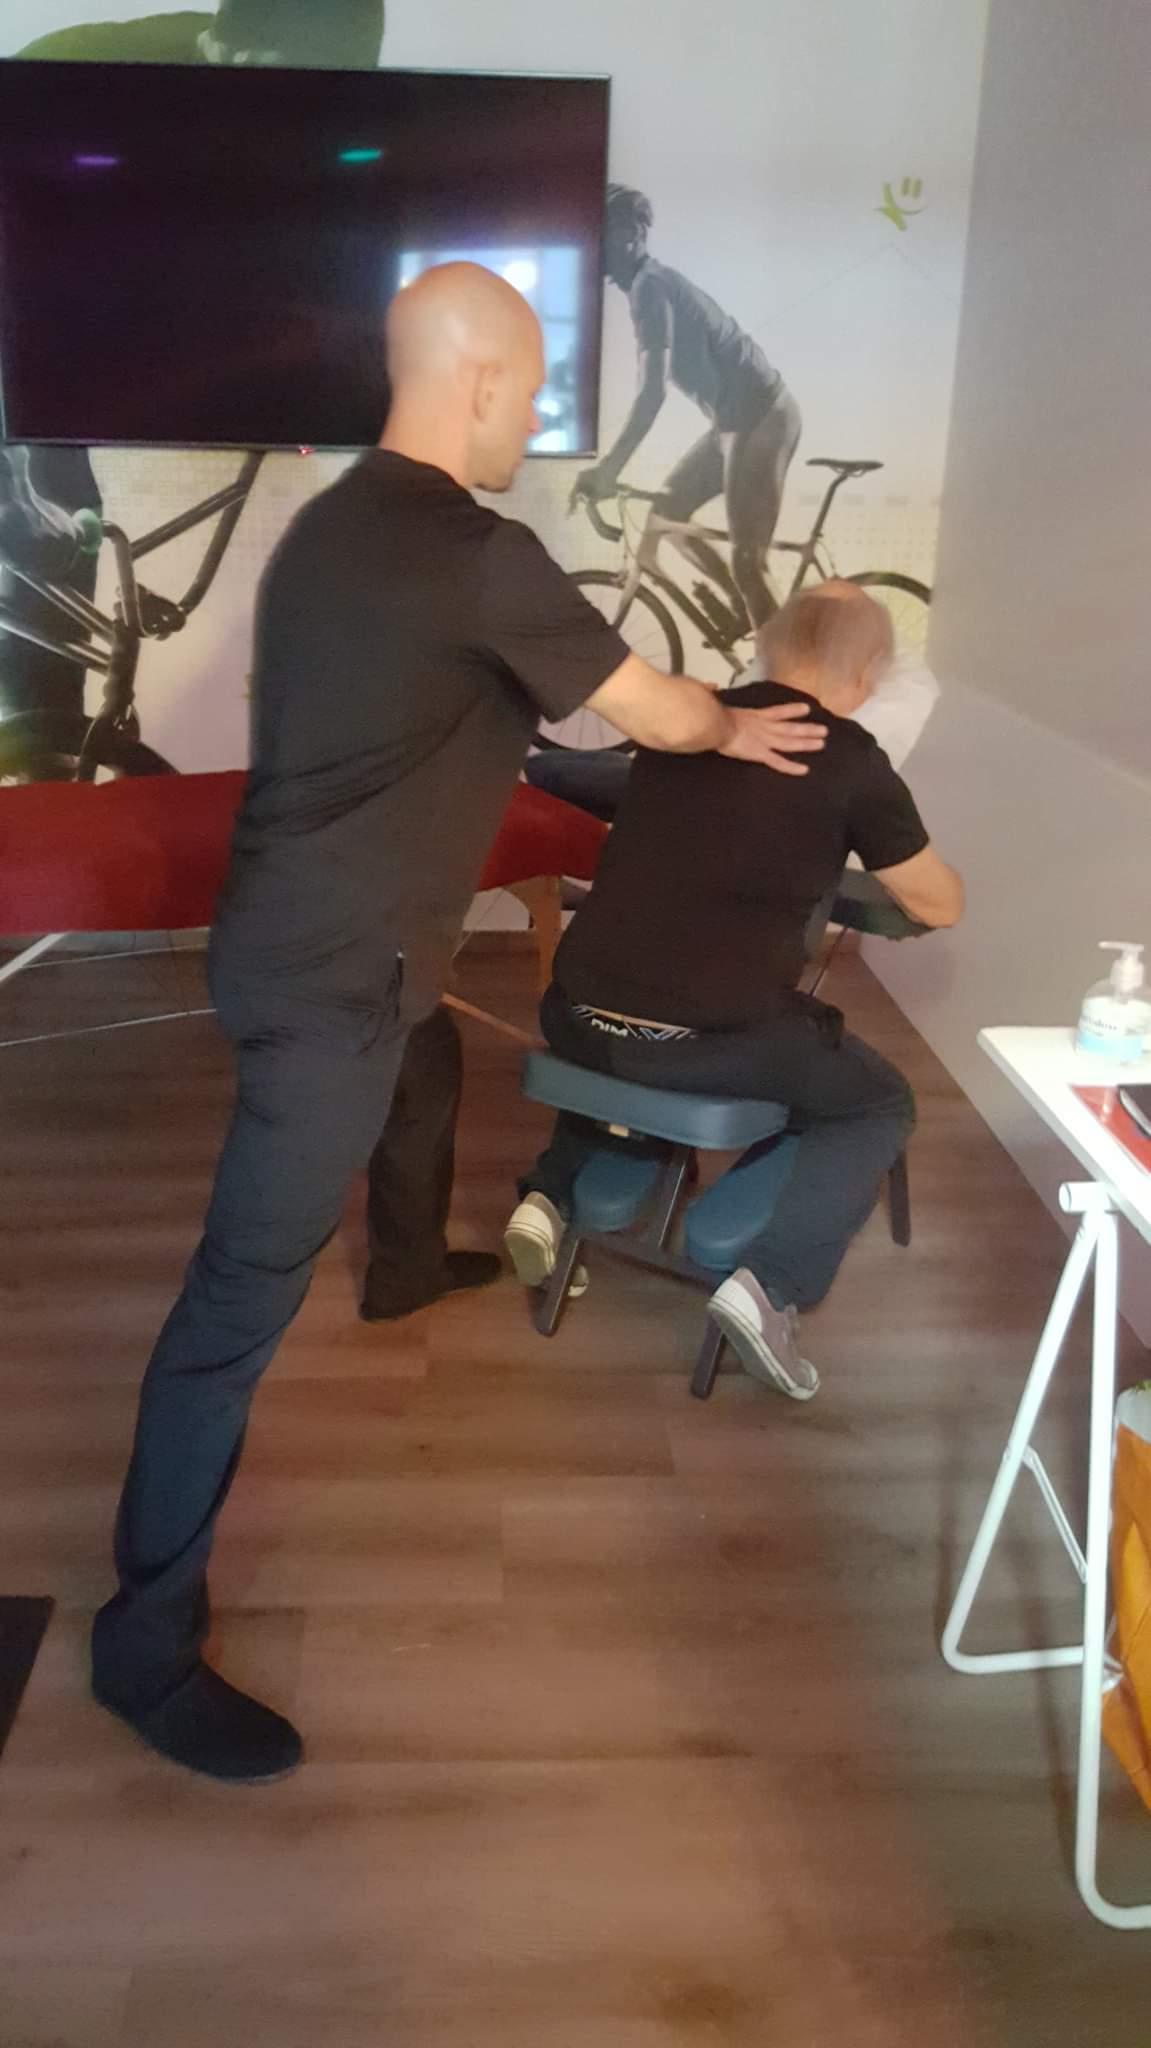 Shiatsu sur chaise ergonomique. Vital Shiatsu Arles, Cédric Peretou.